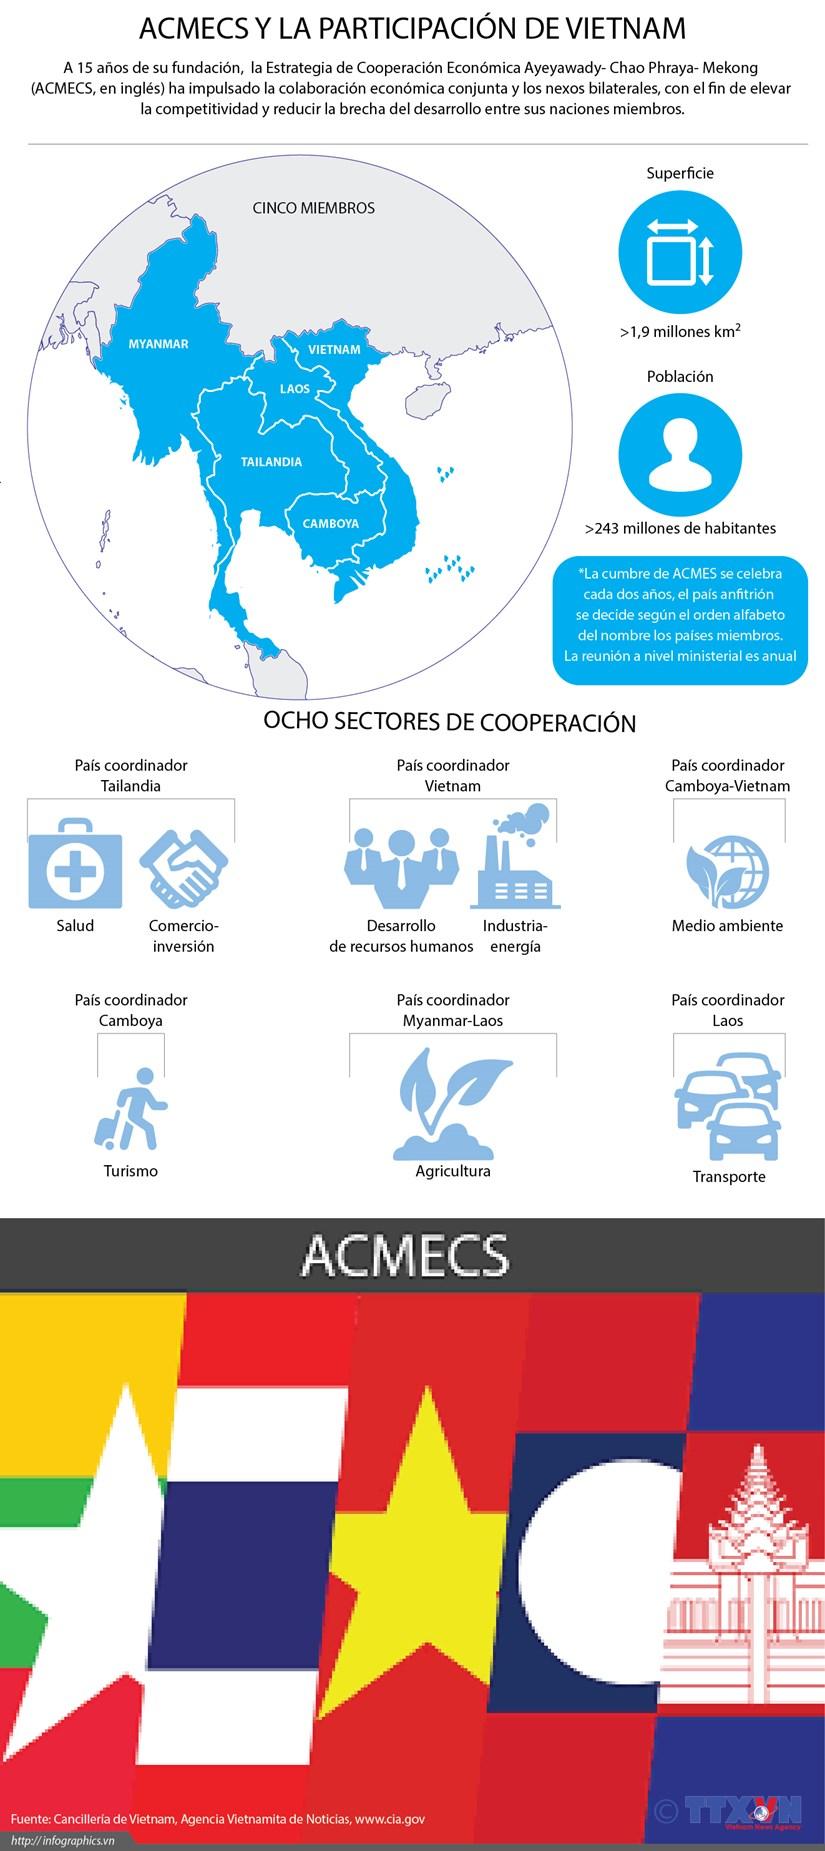 [Infografia] ACMECS Y la participacion de Vietnam hinh anh 1